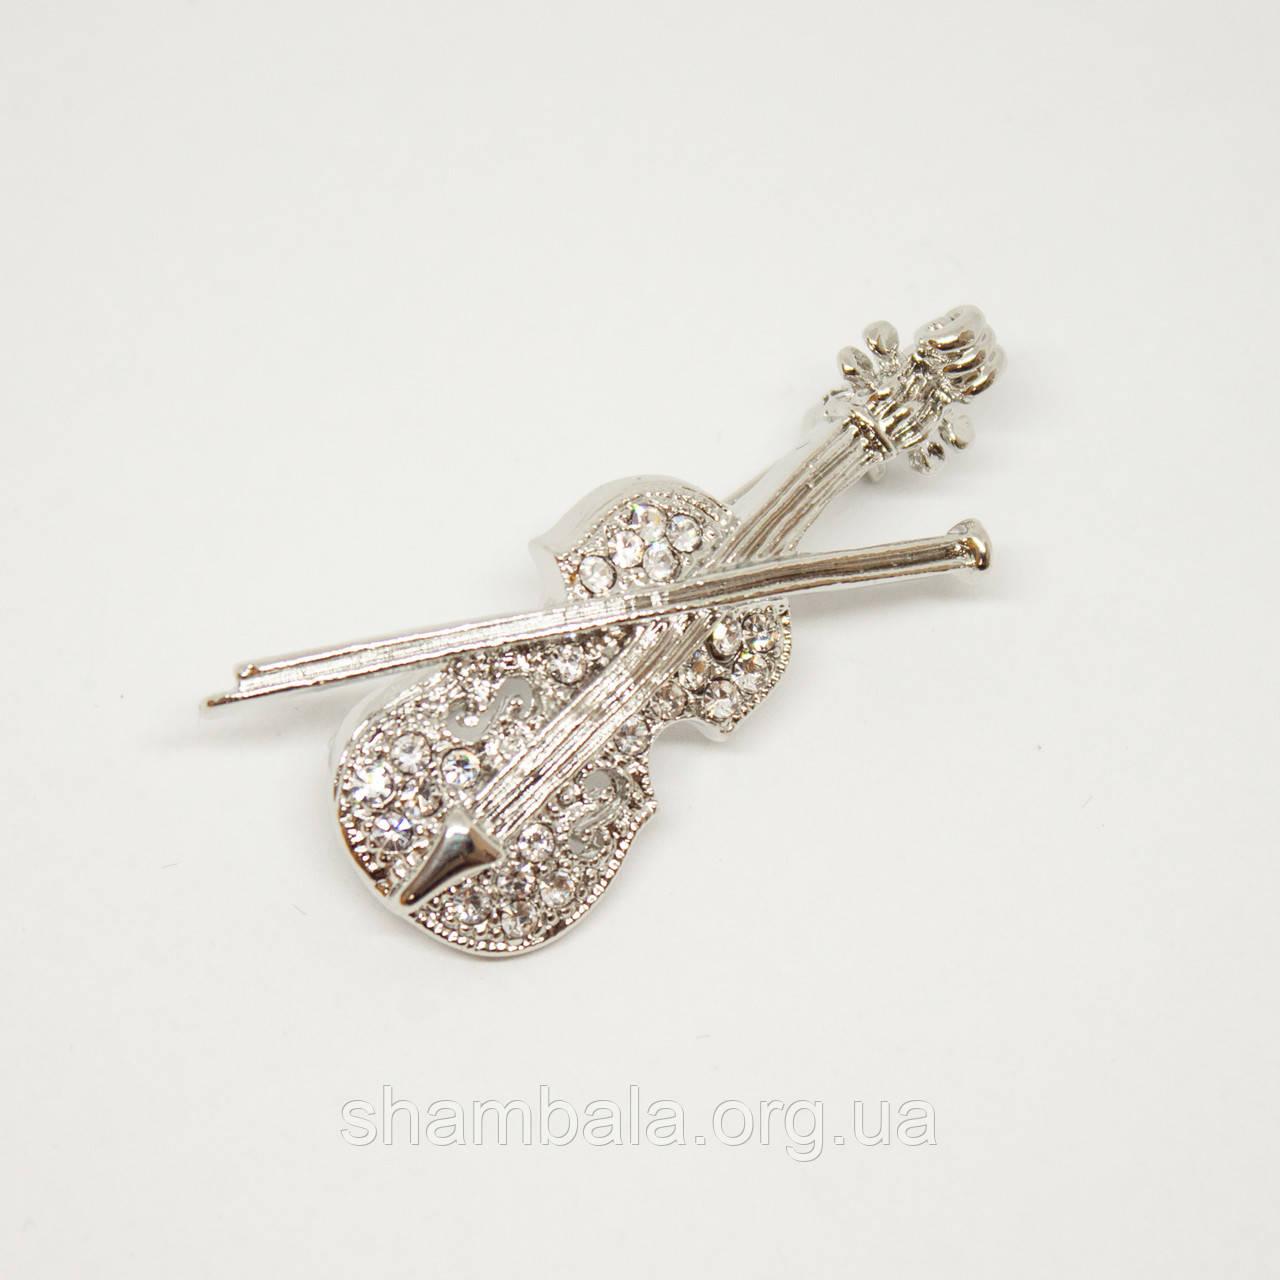 "Брошь Xuping Jewelry ""Скрипка"" (48895)"